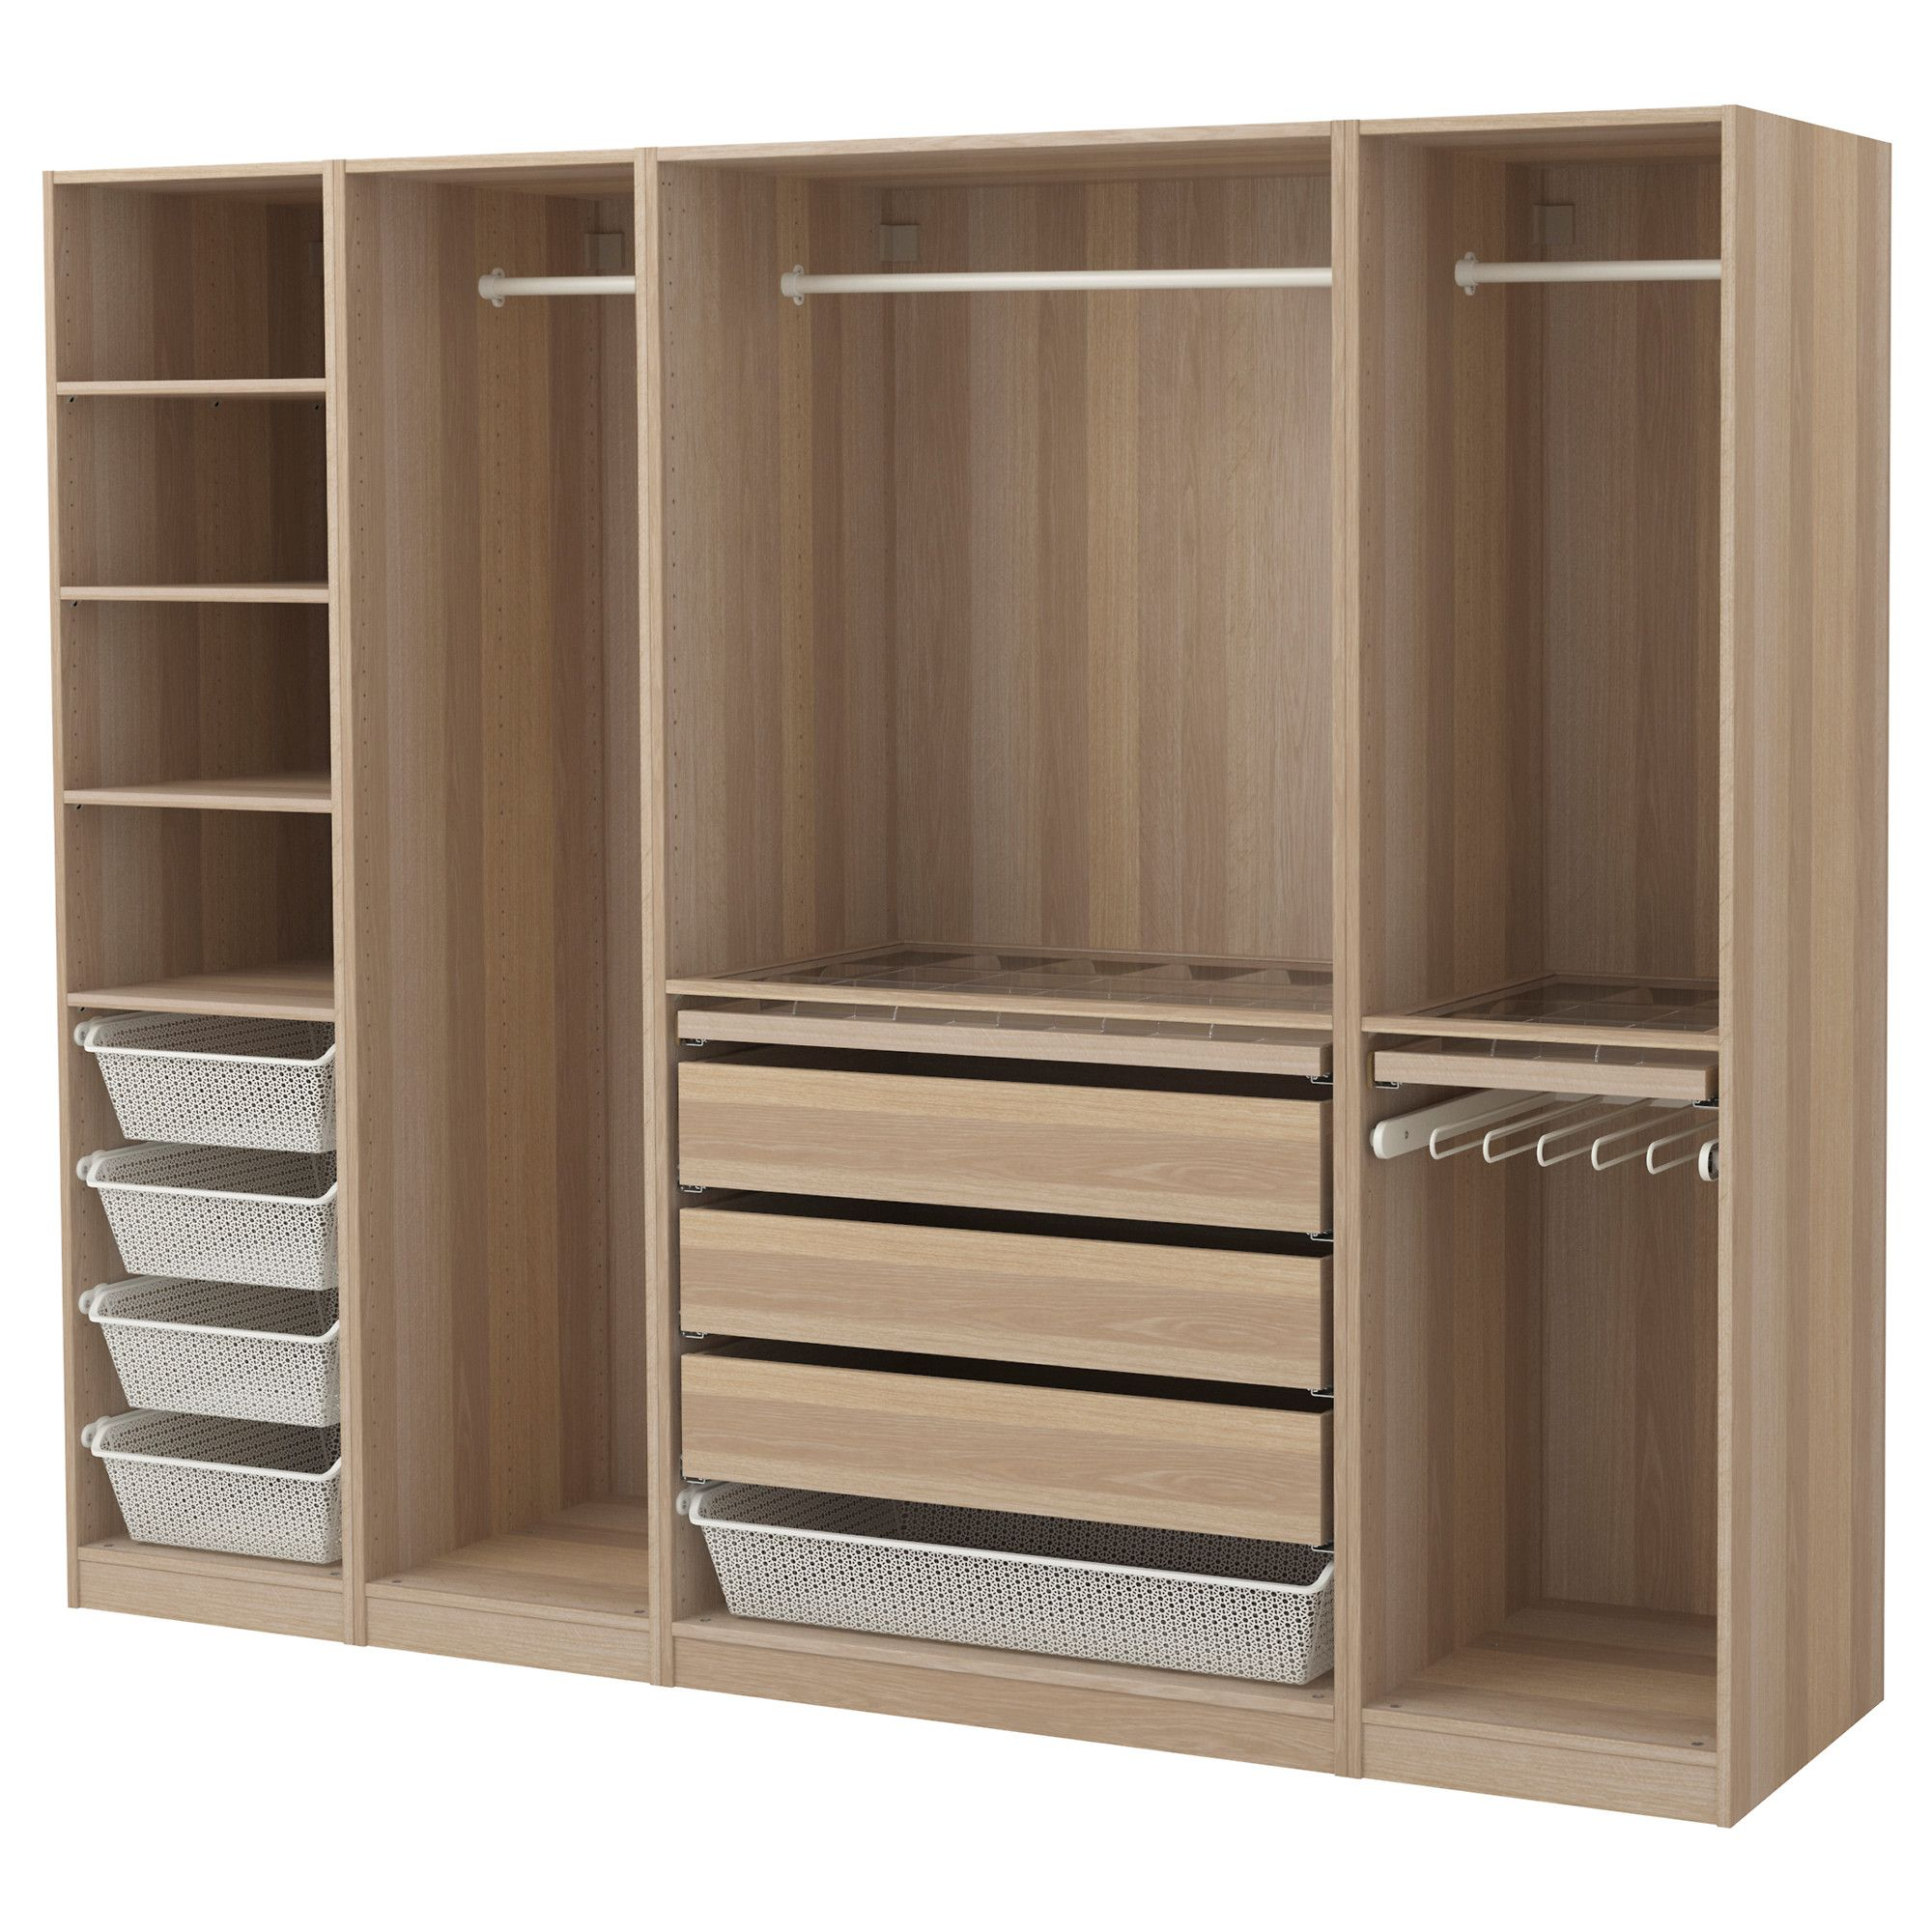 Furniture And Home Furnishings Ikea Wardrobe Storage Ikea